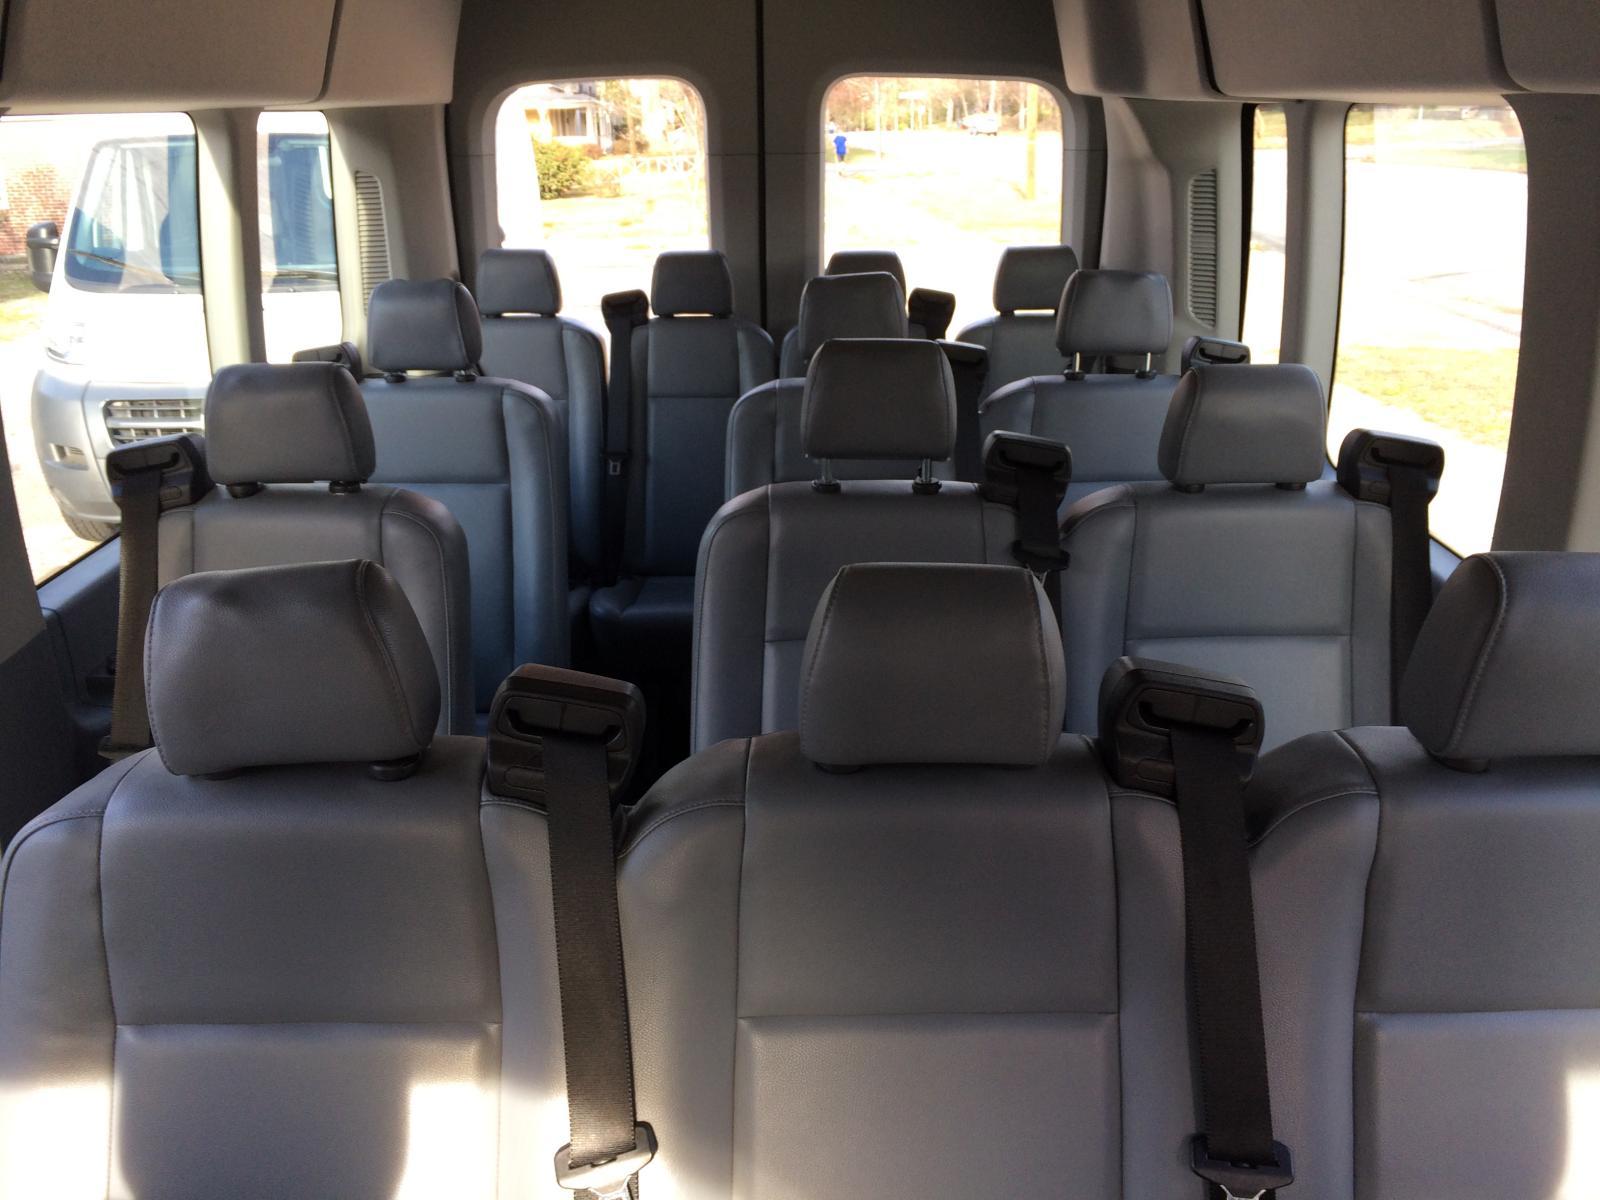 2015 FORD TRANSIT T 350 15 PASSENGER VAN 35,000 MILES